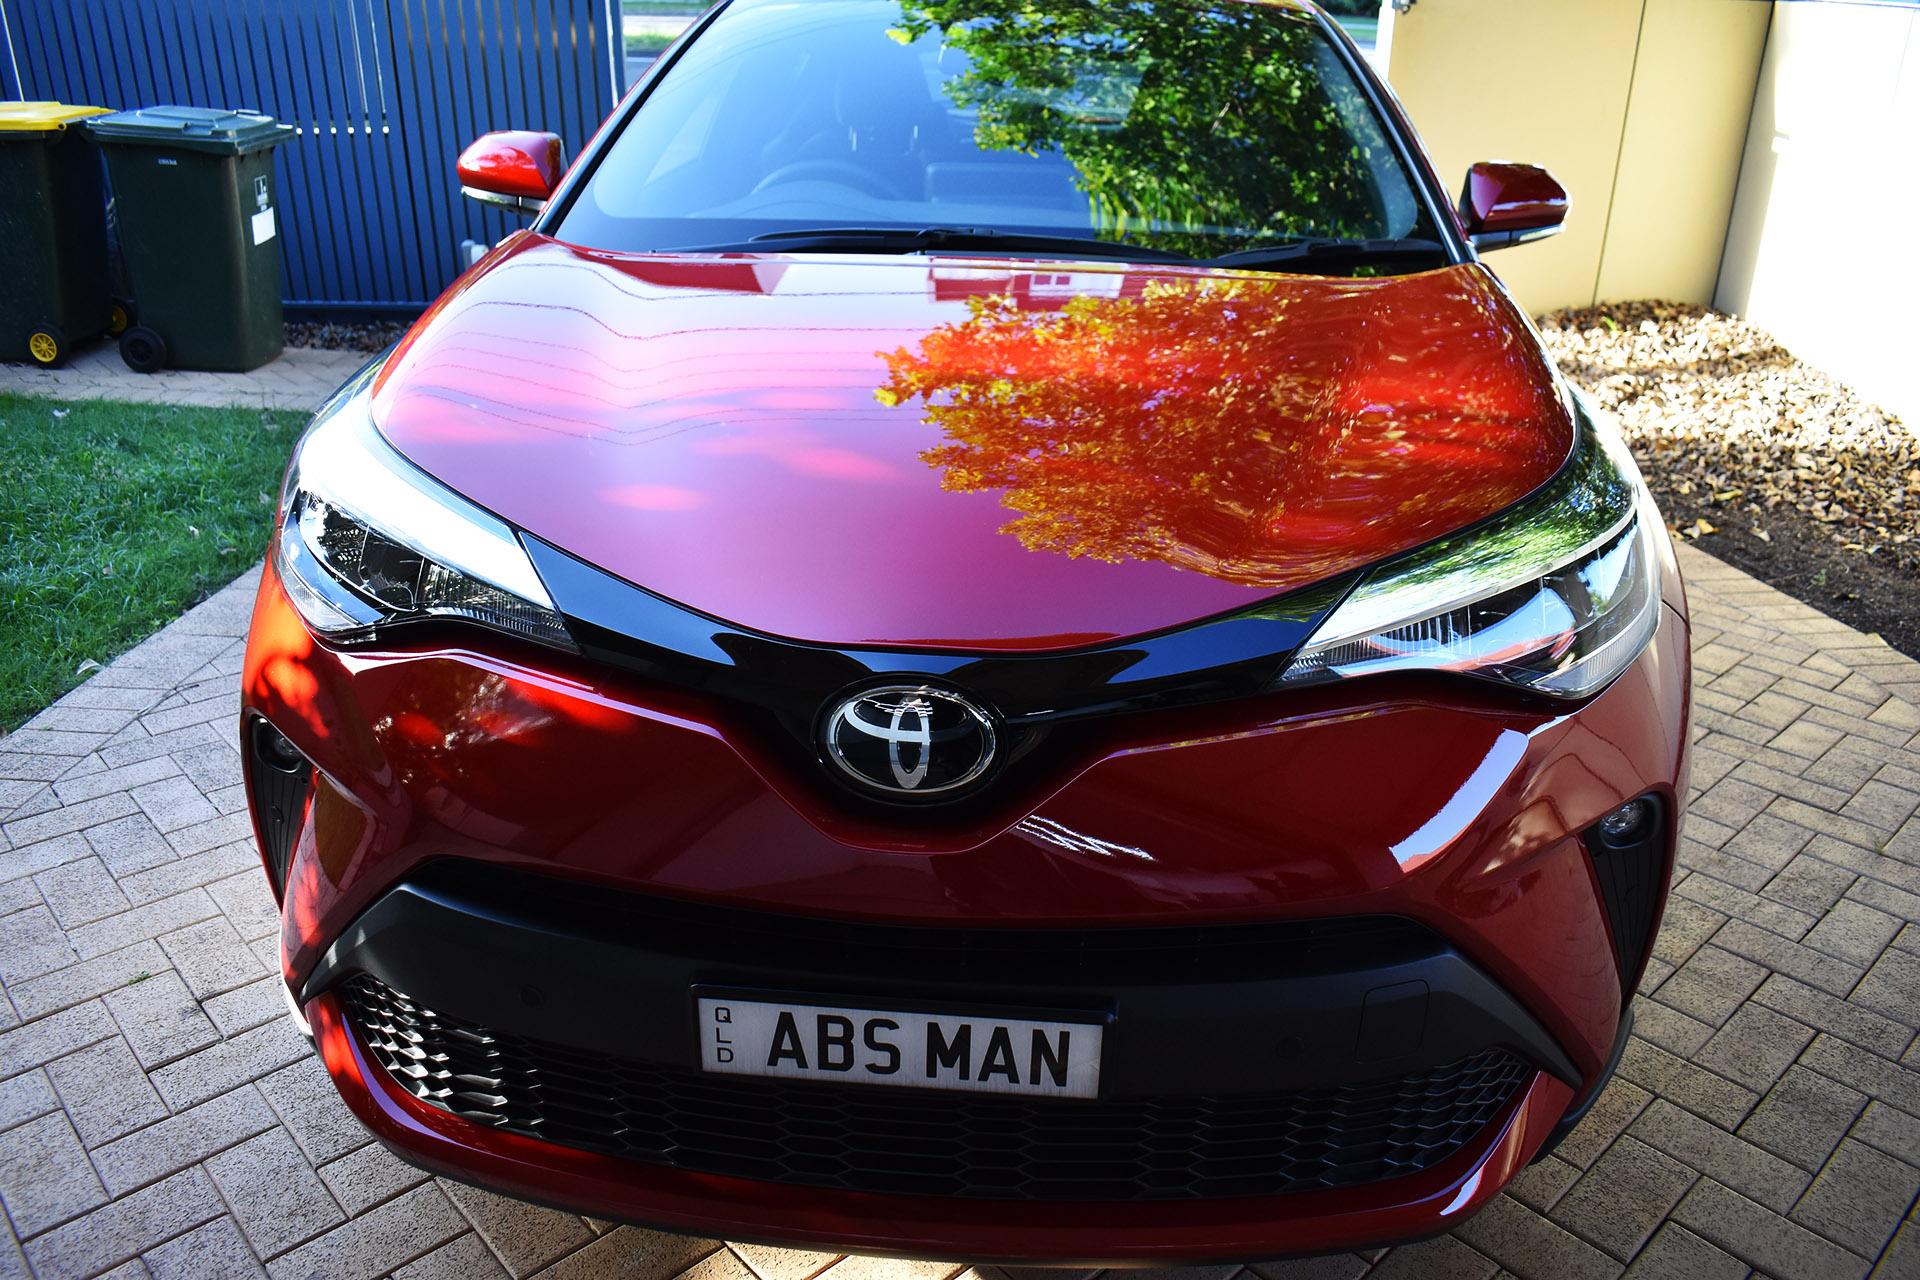 New Car Paint Protection Brisbane - Fireball Ceramic Coating 8